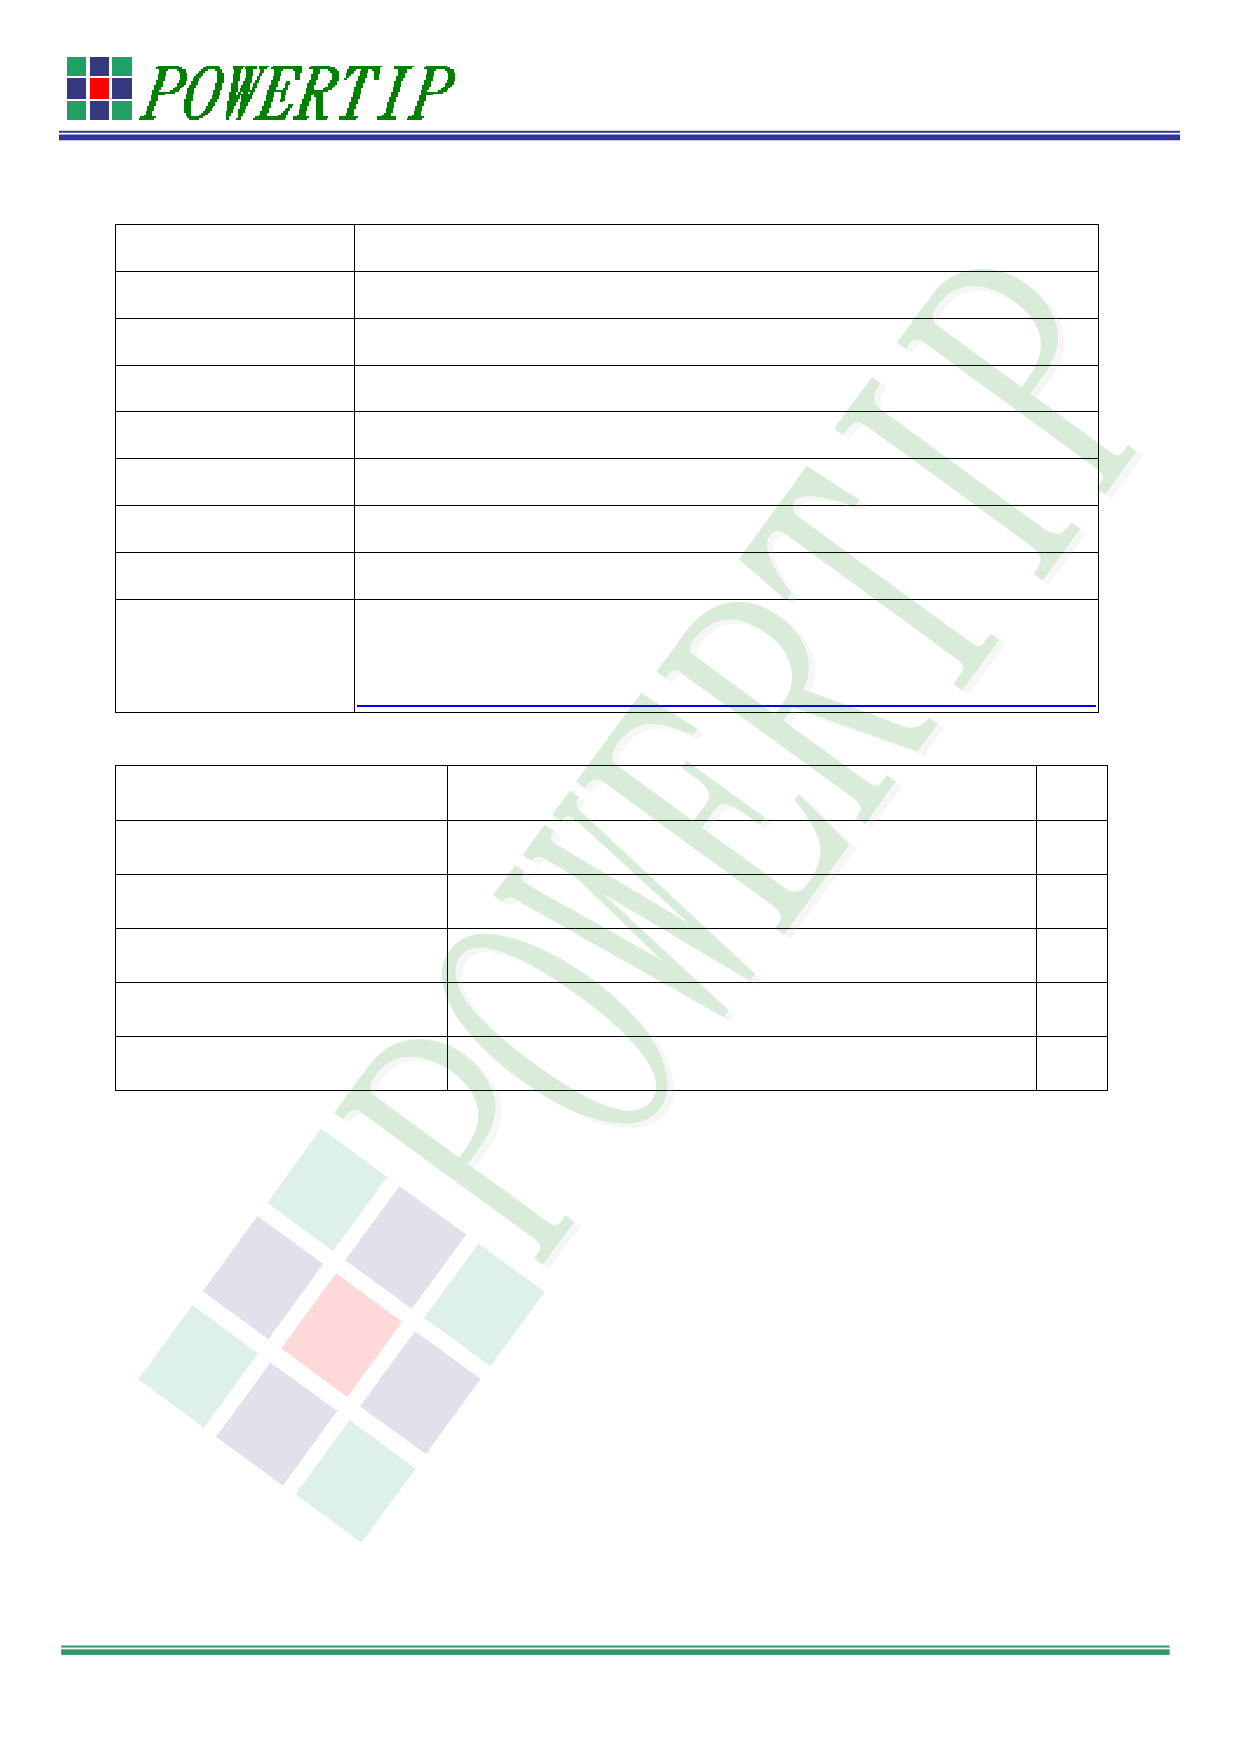 NPC1602WRP-GWA-I pdf, 반도체, 판매, 대치품